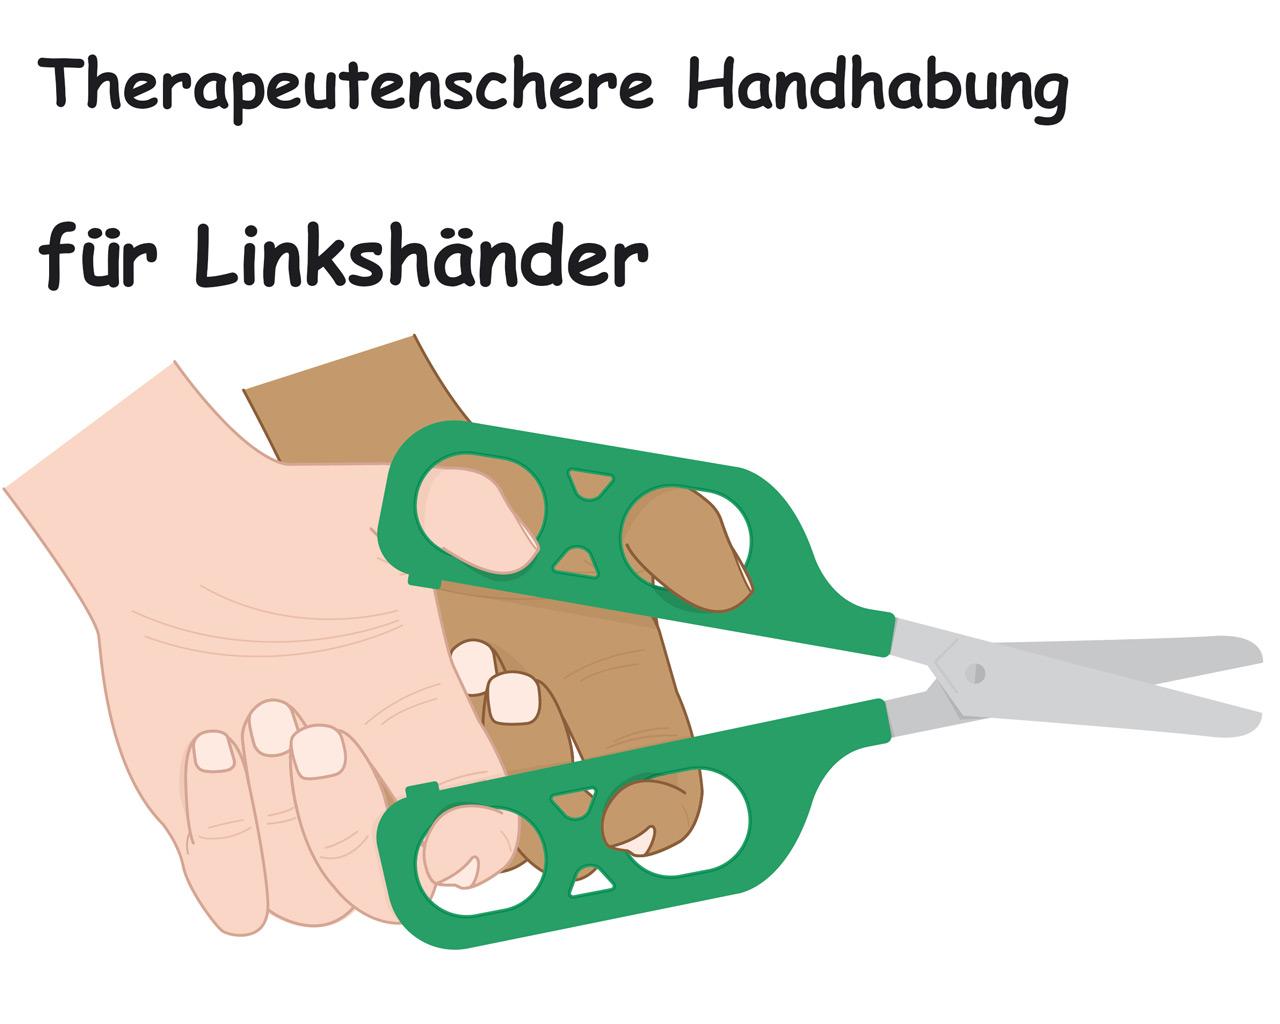 Therapeutenschere-Handhabung-fuer-Linkshaender-illustration-PETA-lafueliki